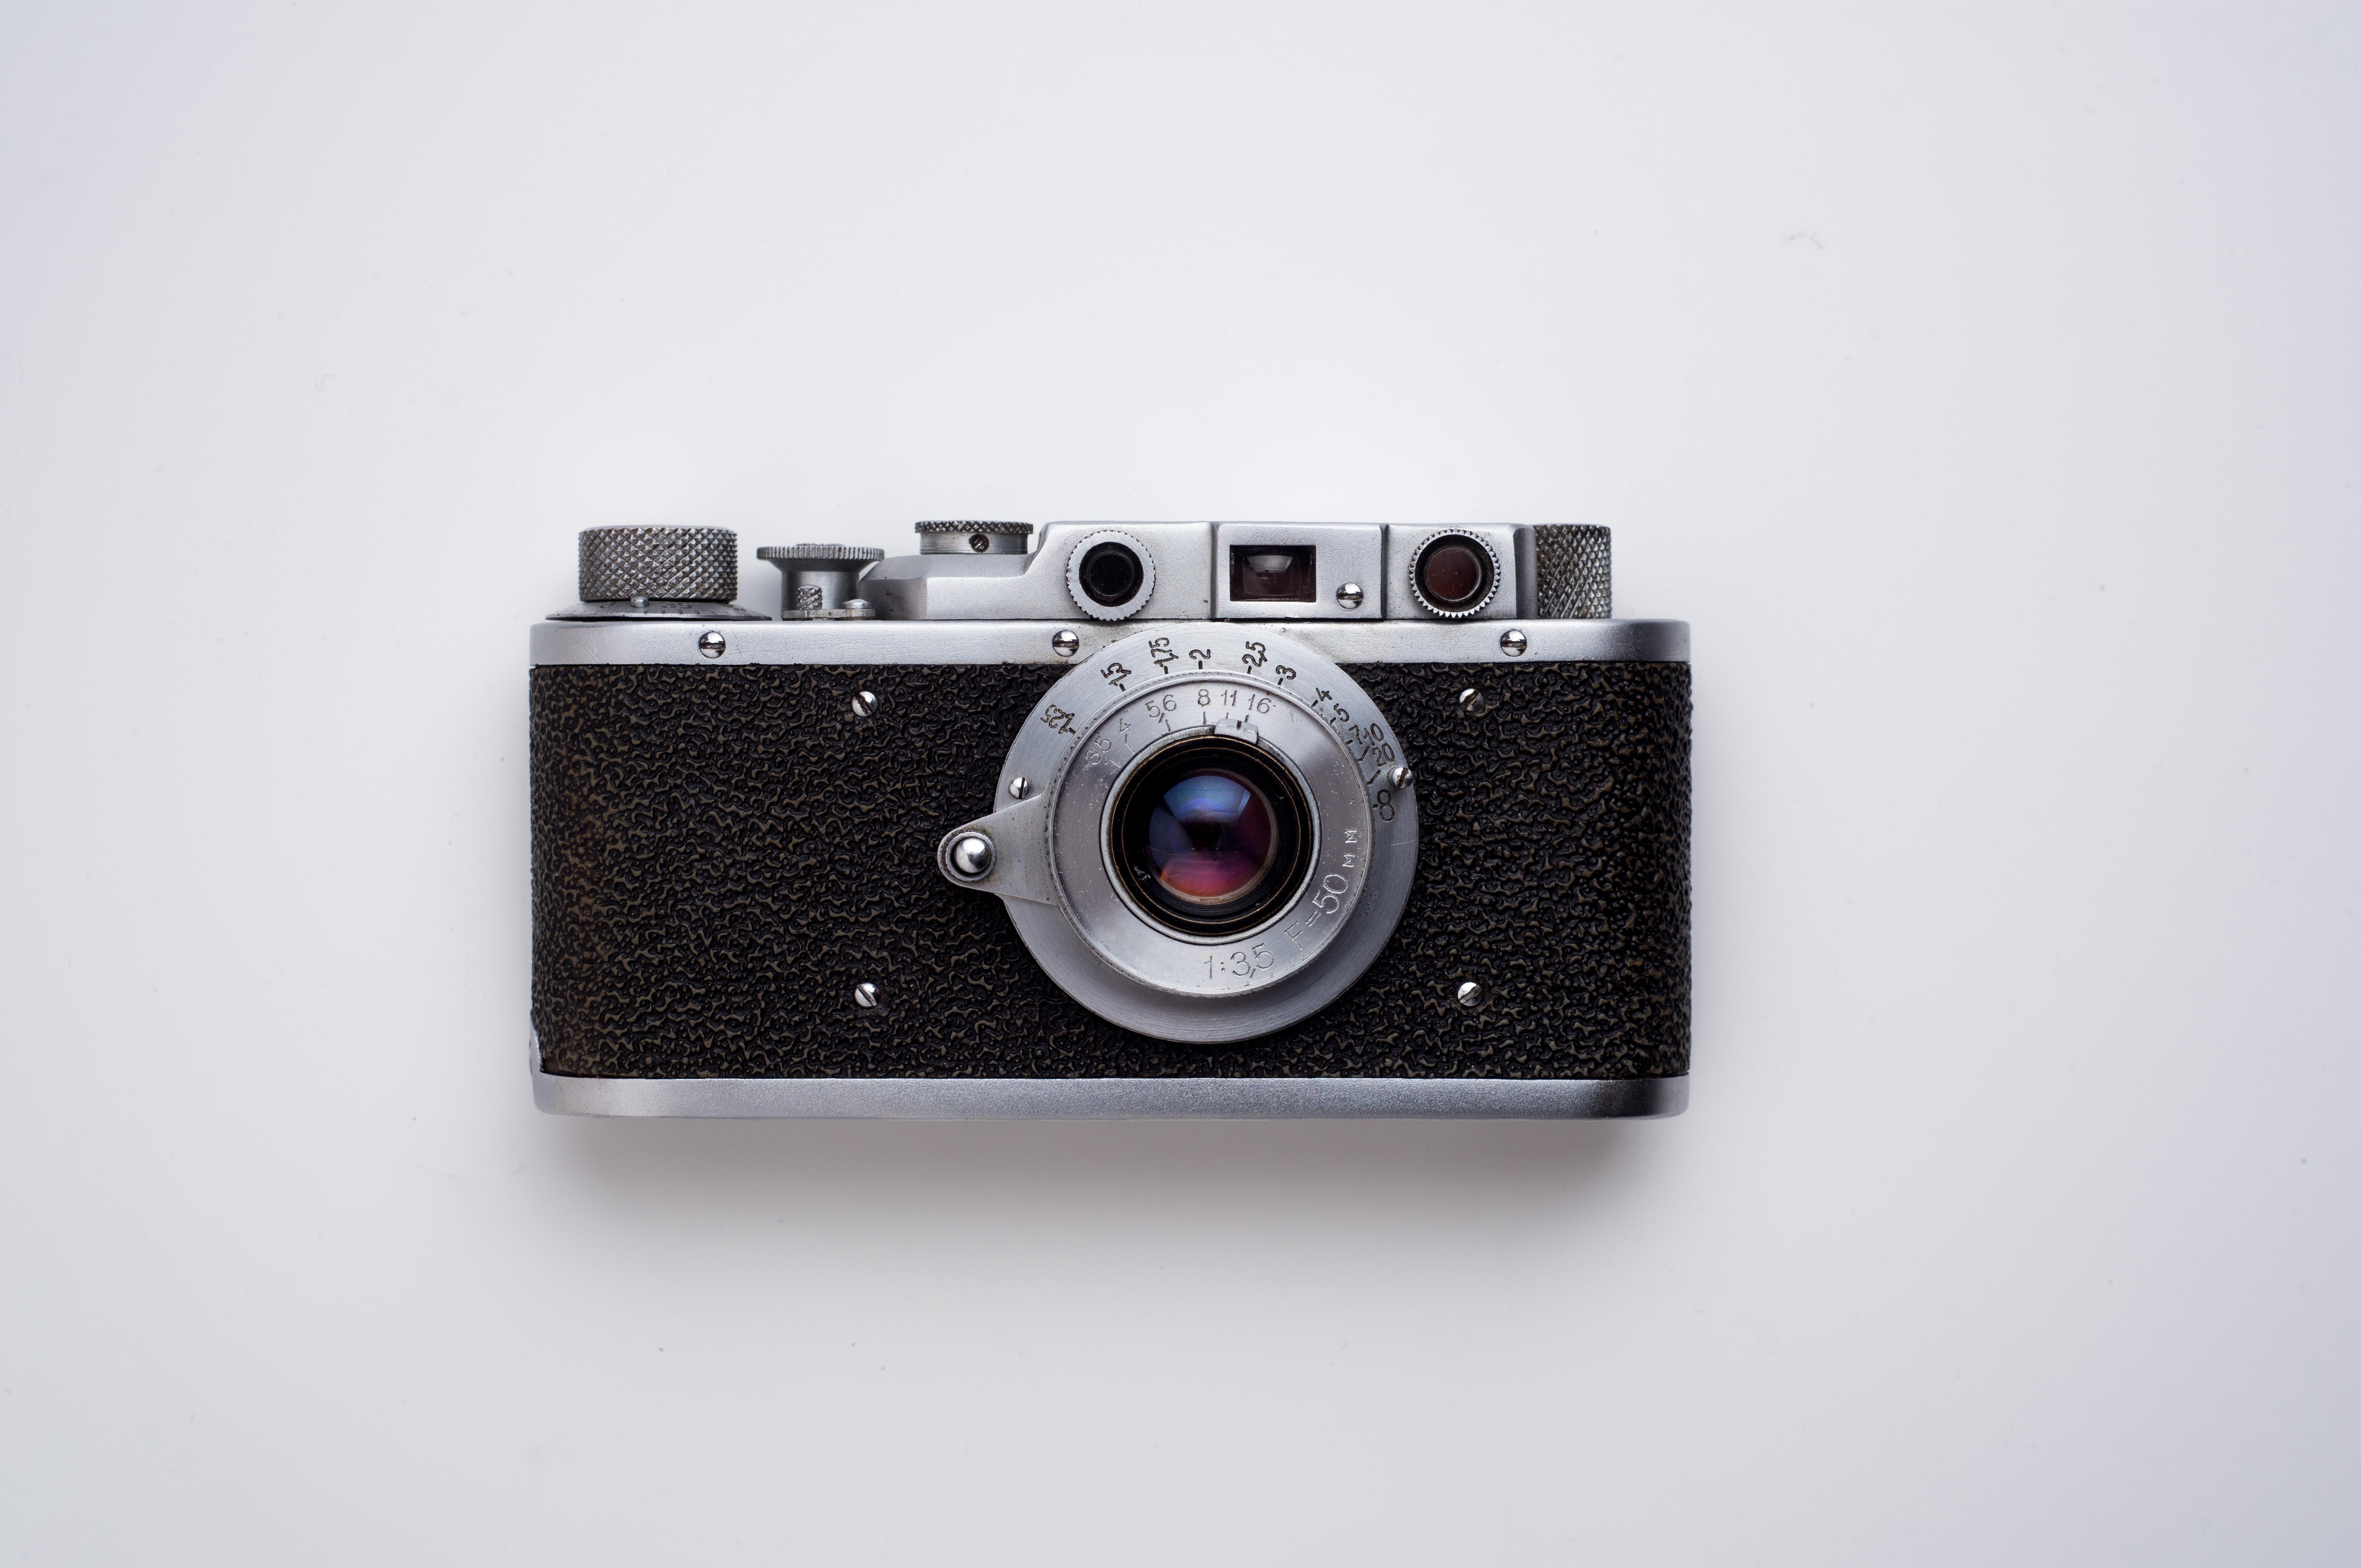 black and gray SLR camera on white background